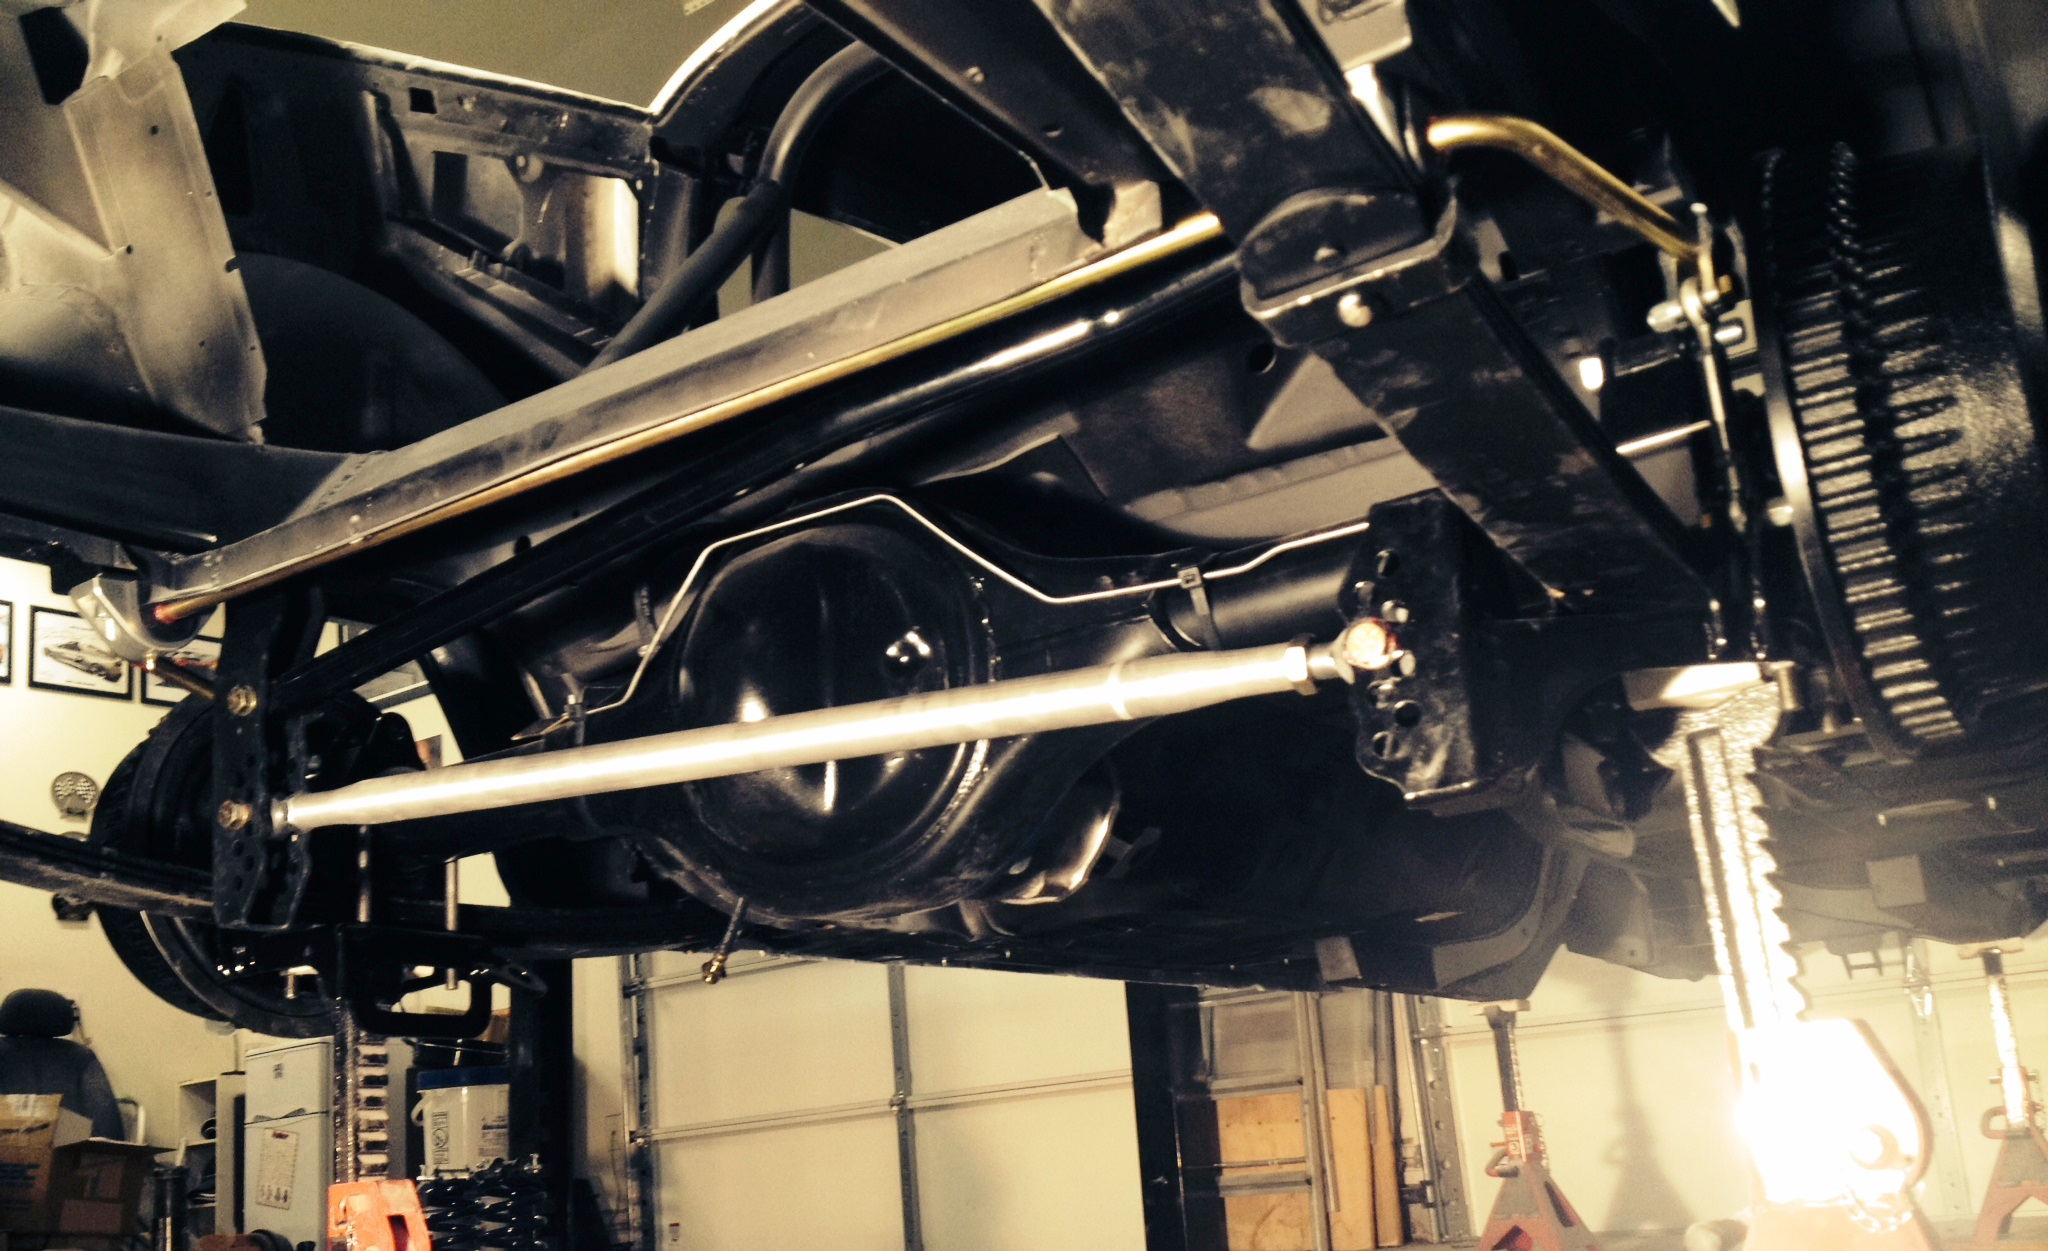 1965 1970 ford mustang rear suspension kit